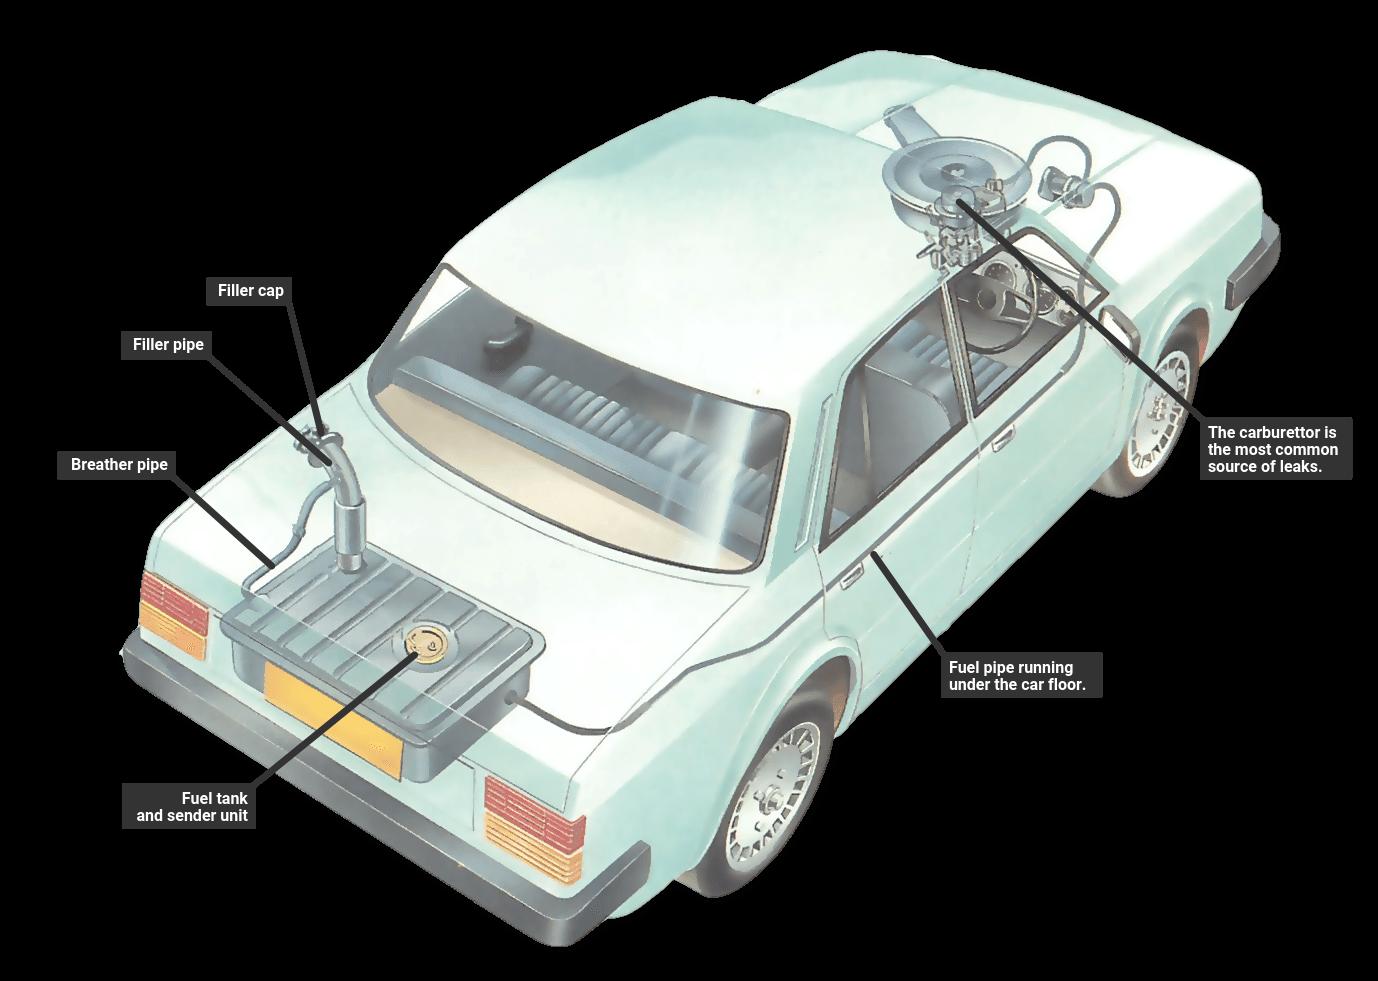 Garage Door Switch Schematics Servicing The Fuel Supply System How A Car Works